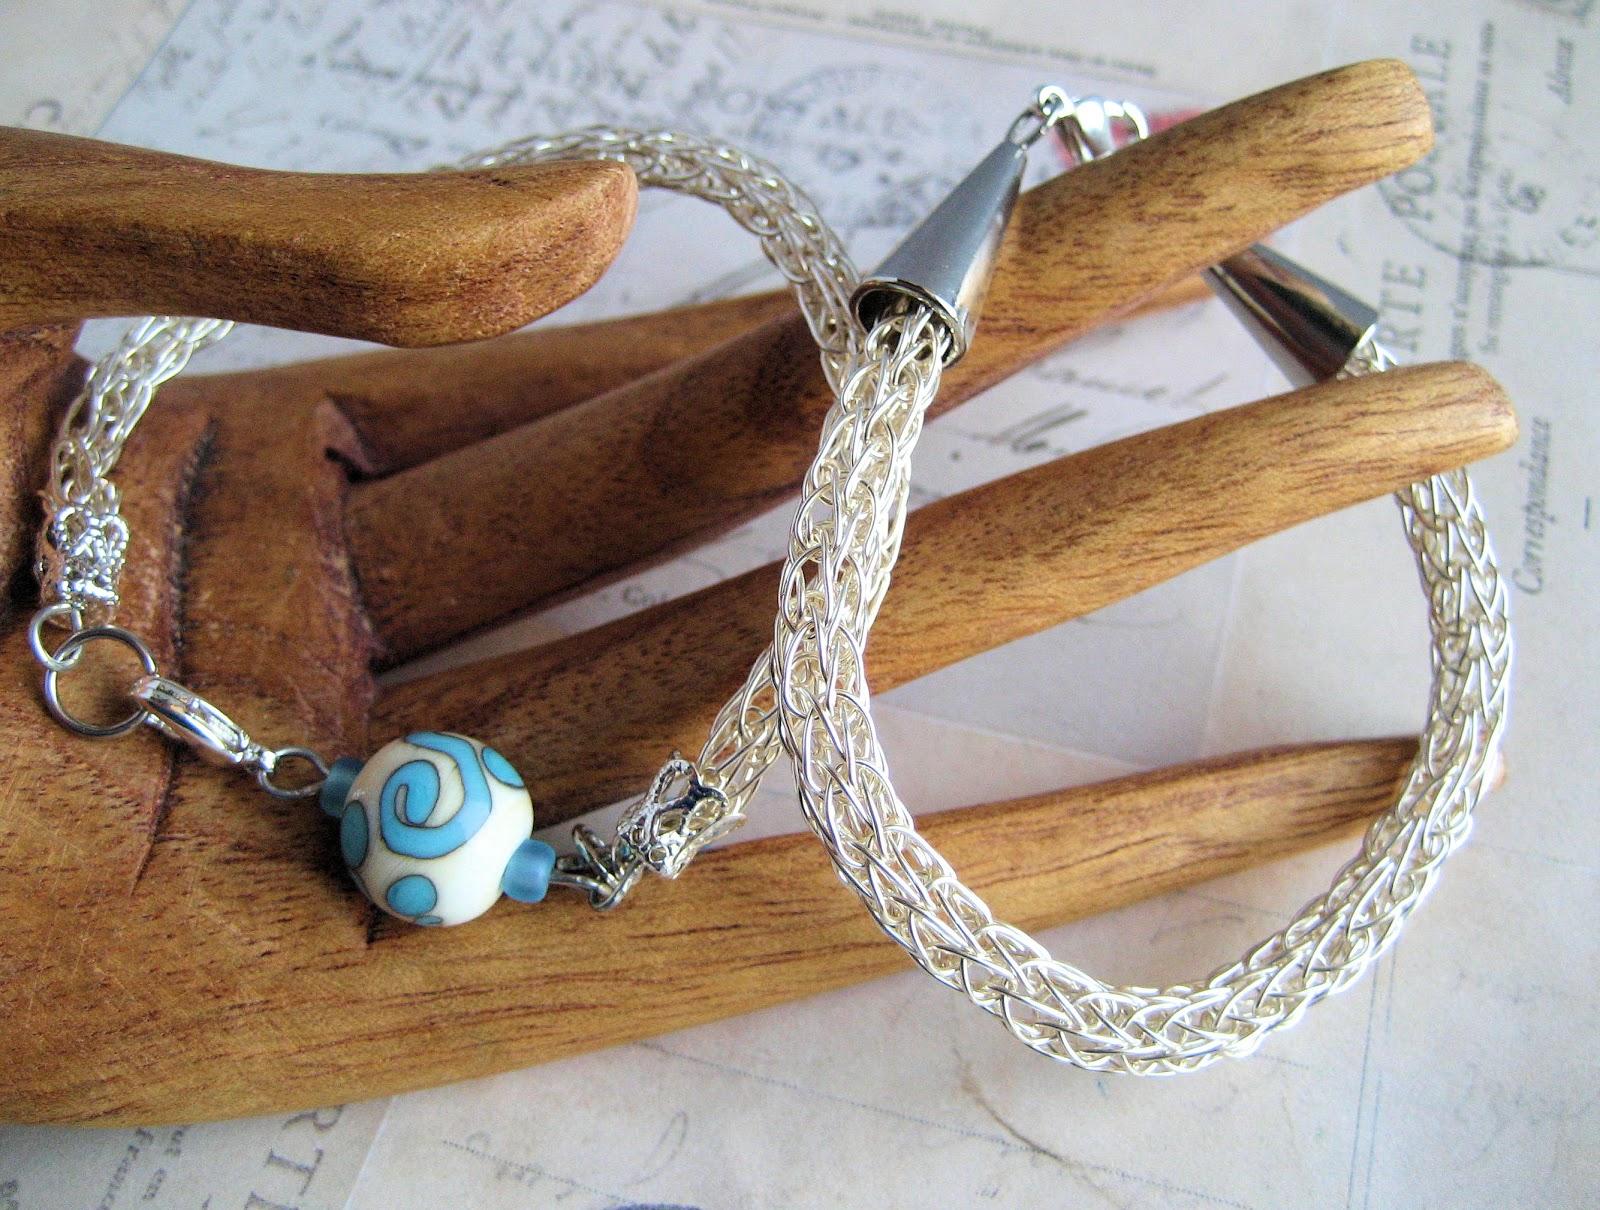 Knot Just Macrame by Sherri Stokey: Learning Viking Knit